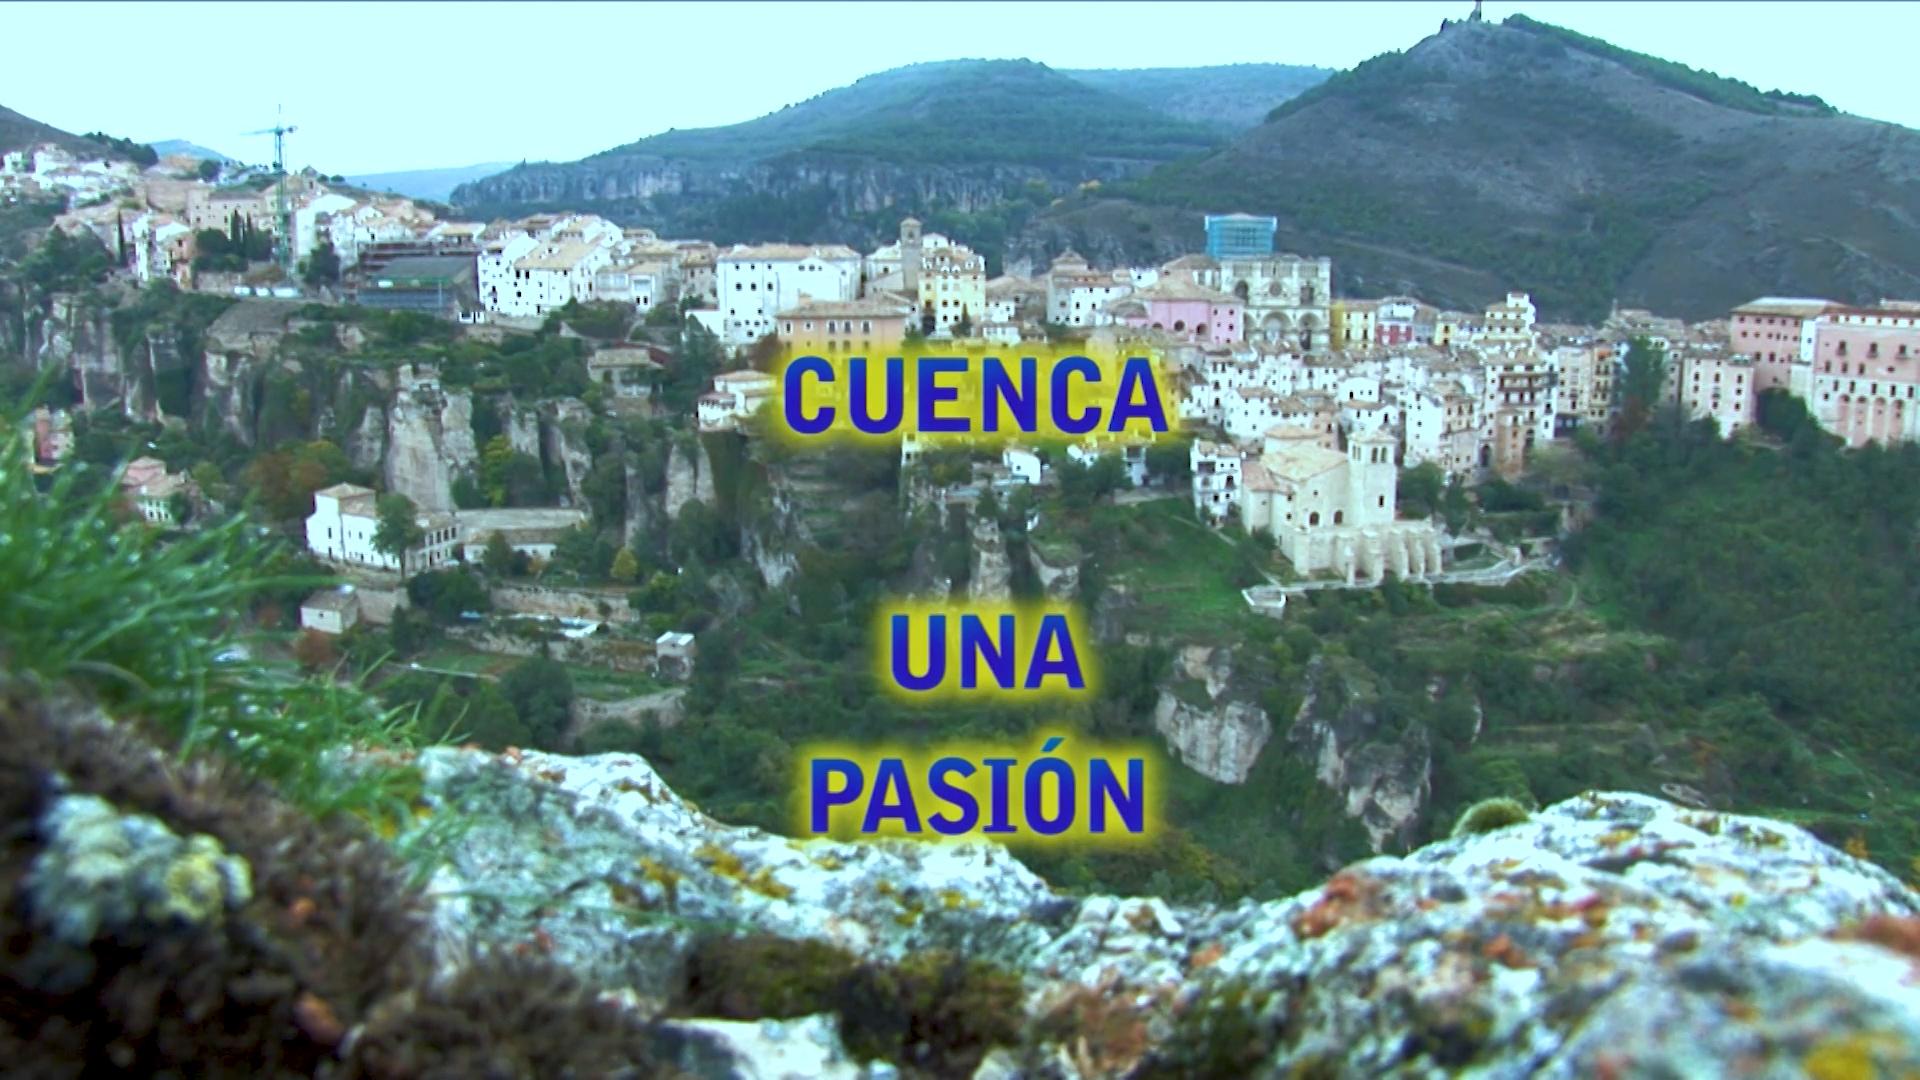 cuenca ujna pasion | Liberal de Castilla